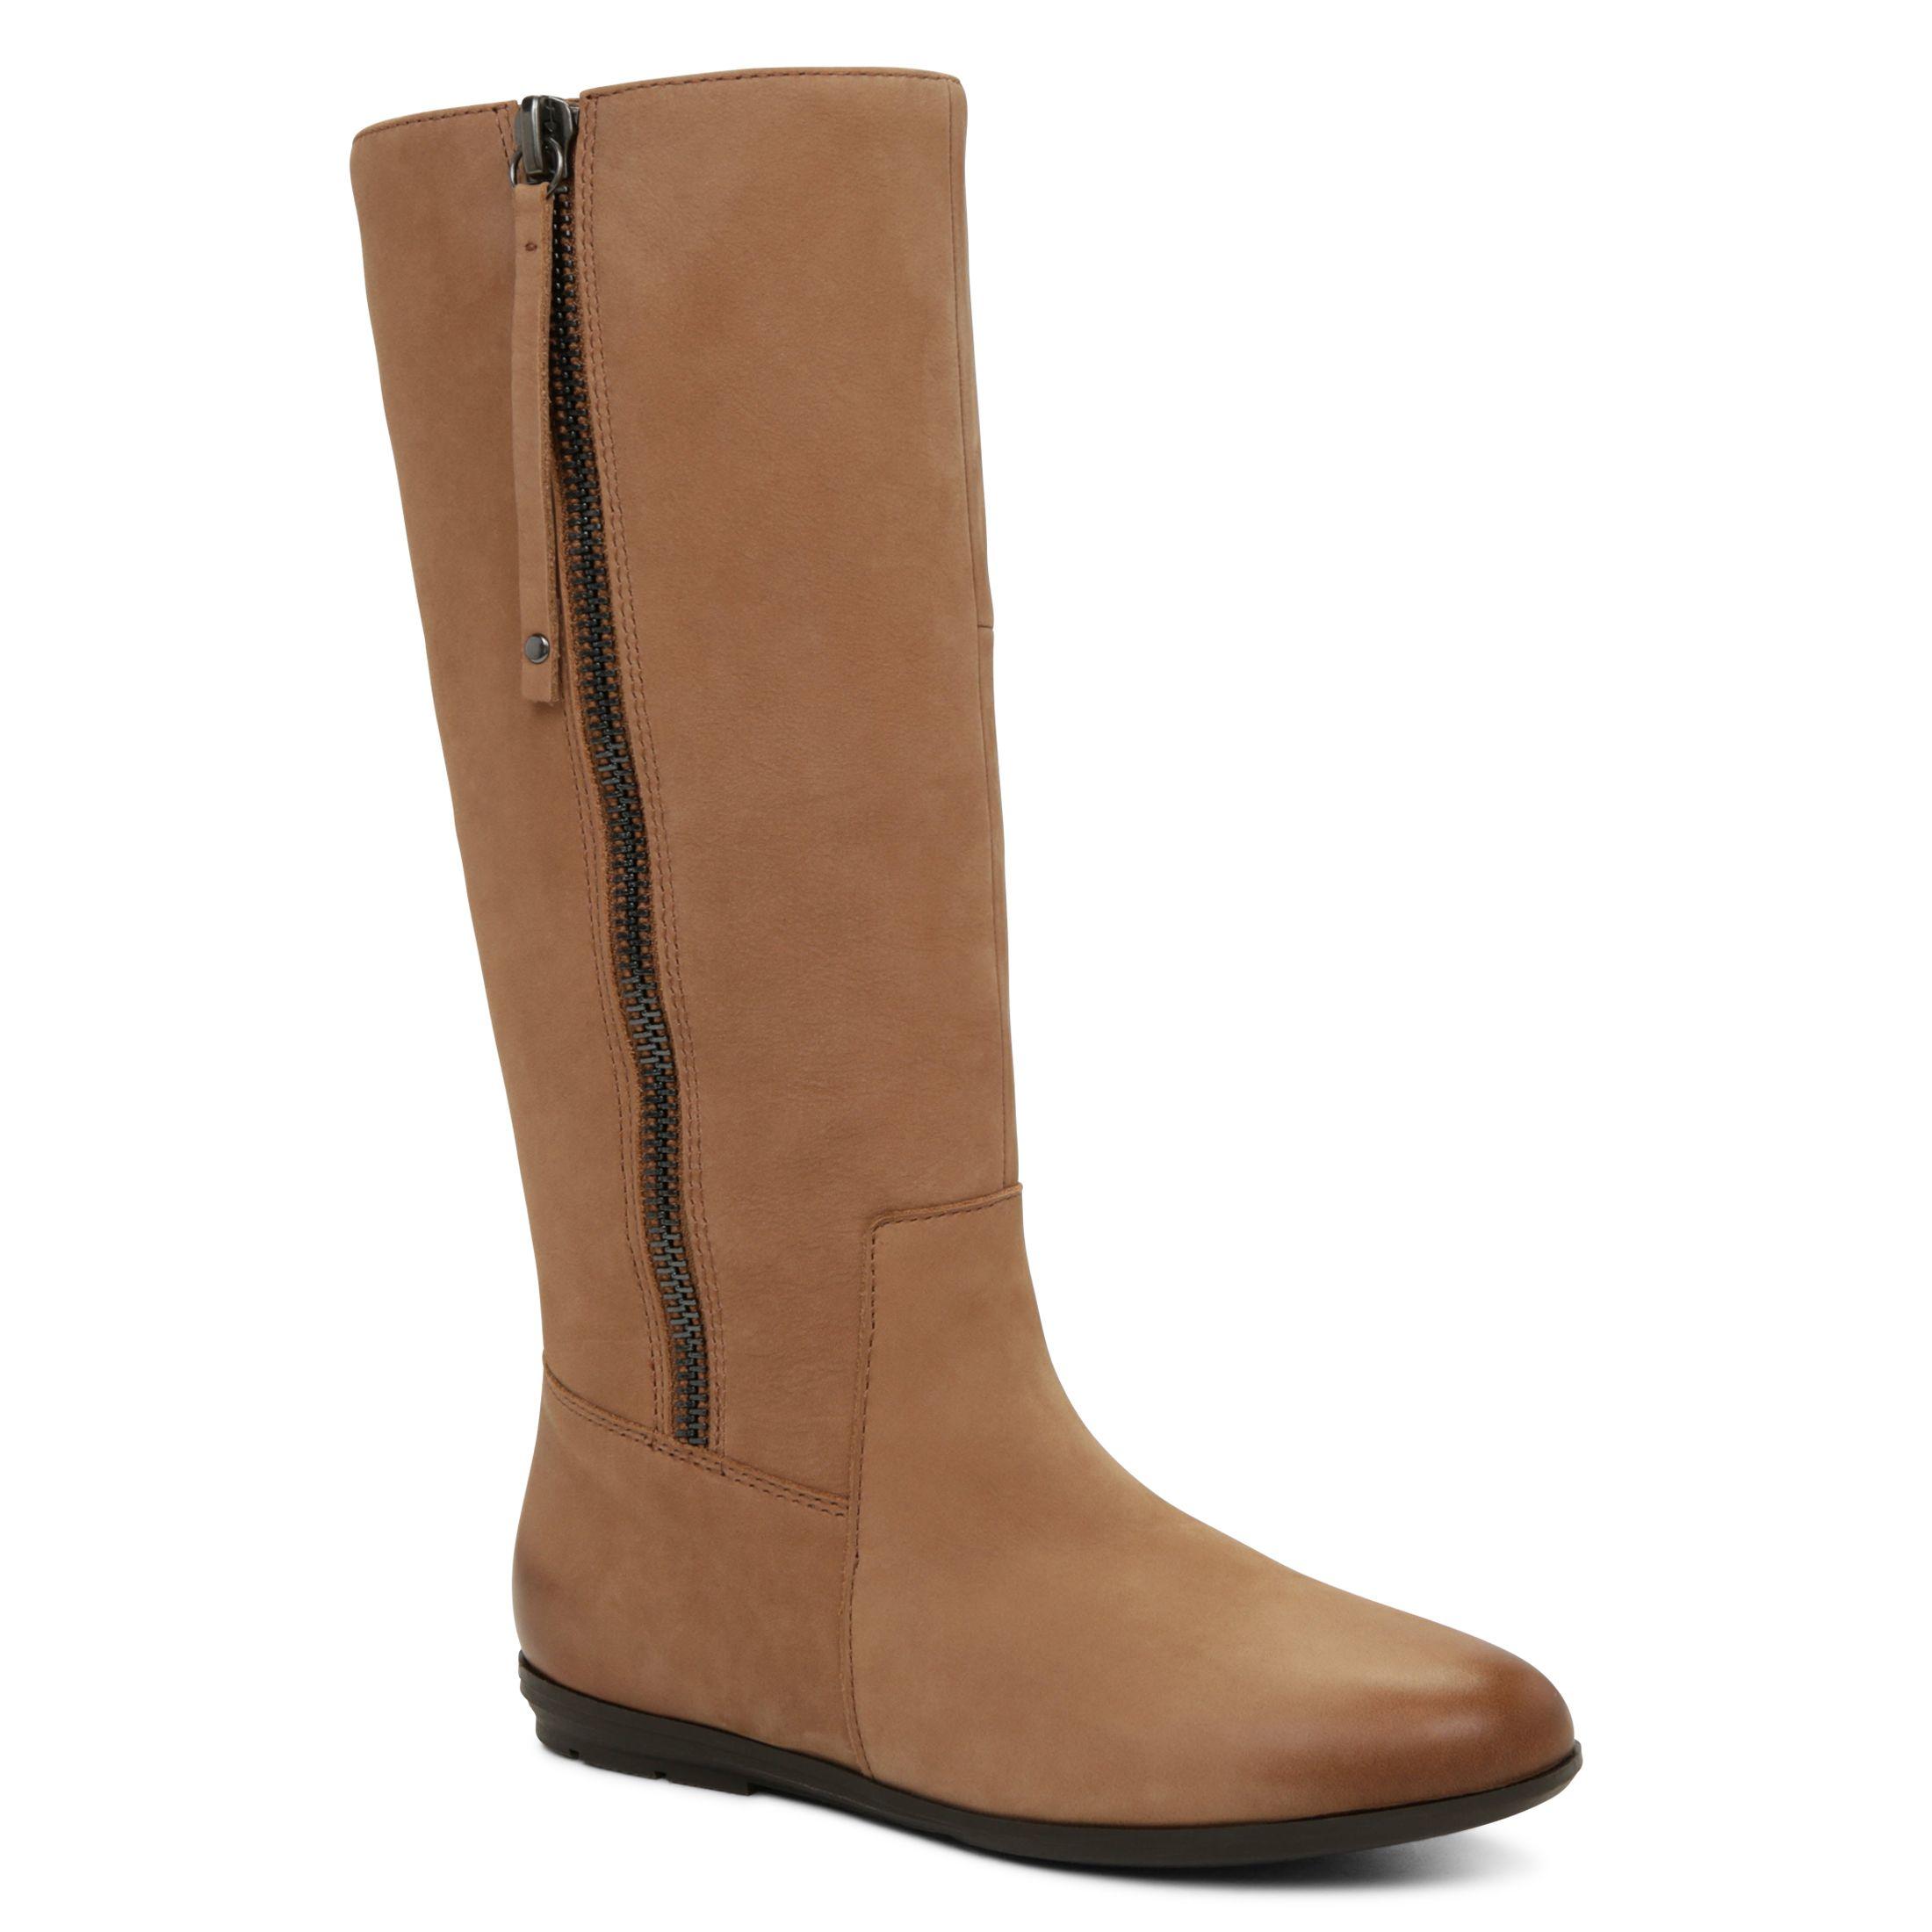 Womens Boots ALDO Nizza Camel